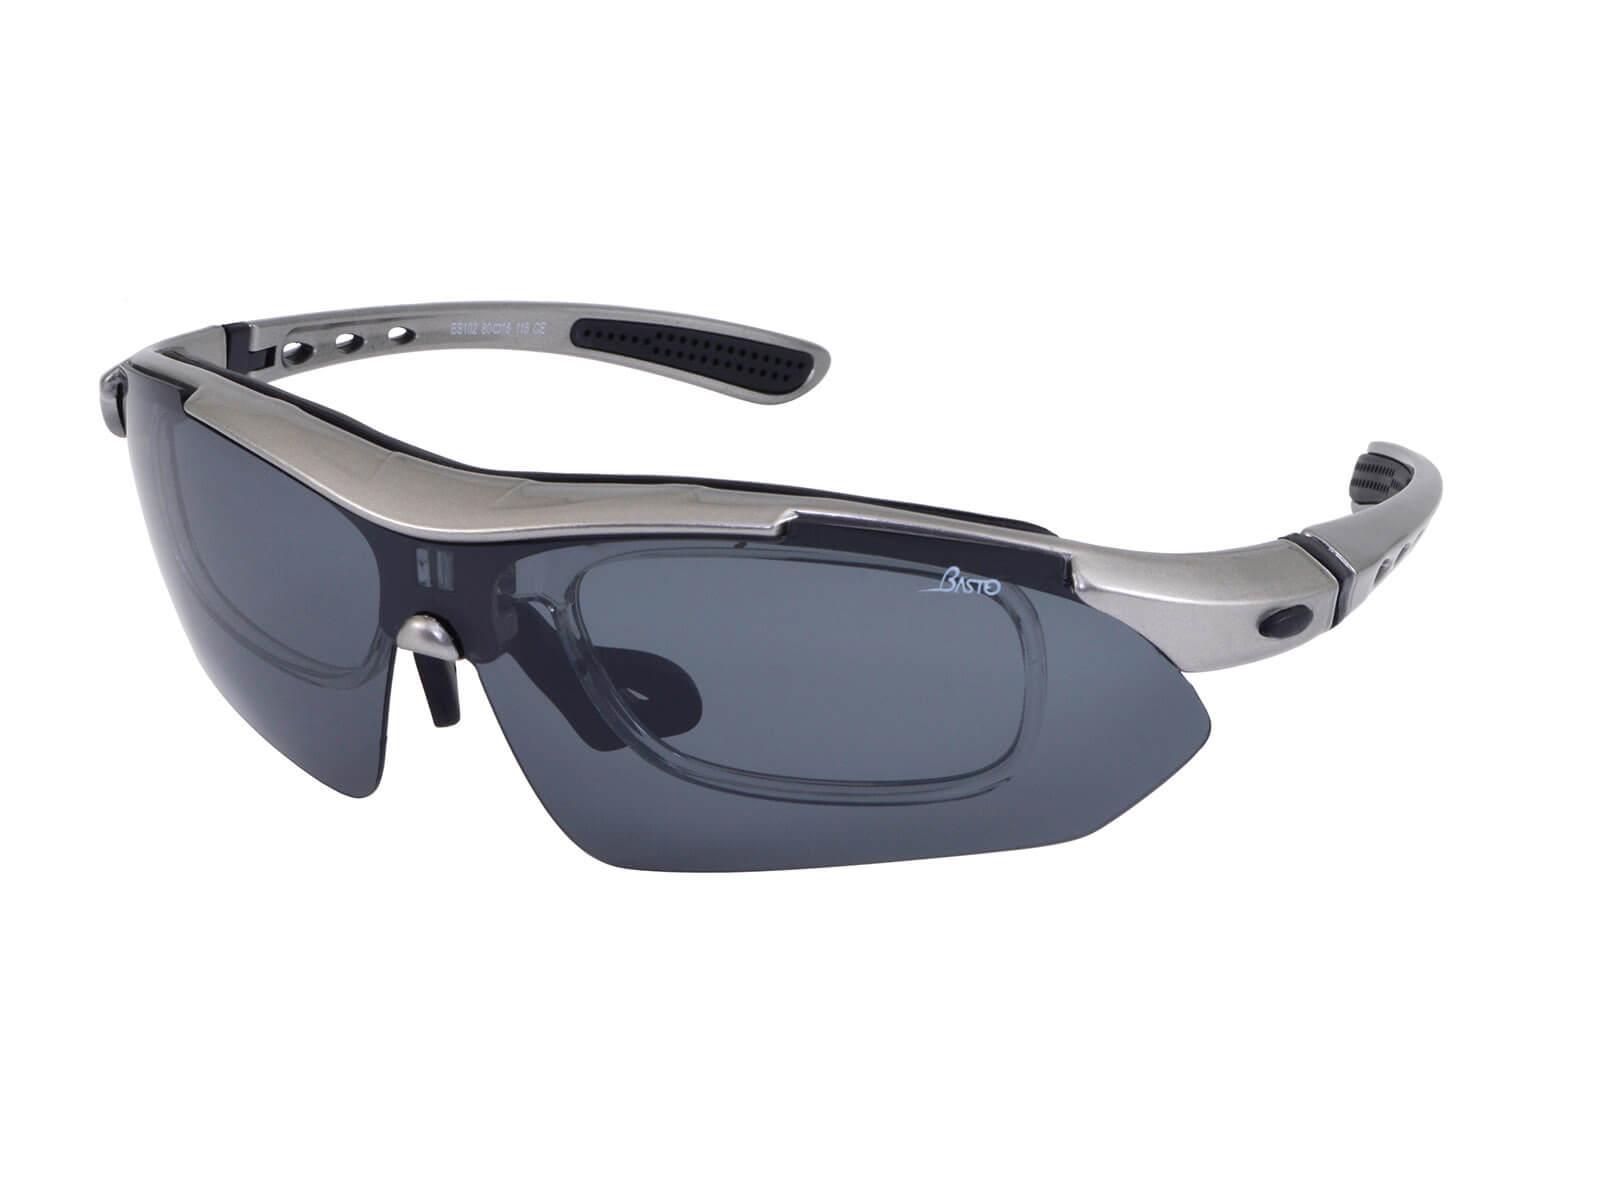 c498fdb742 Sports eyewear from Pybus Opticians in Canterbury - Pybus Opticians